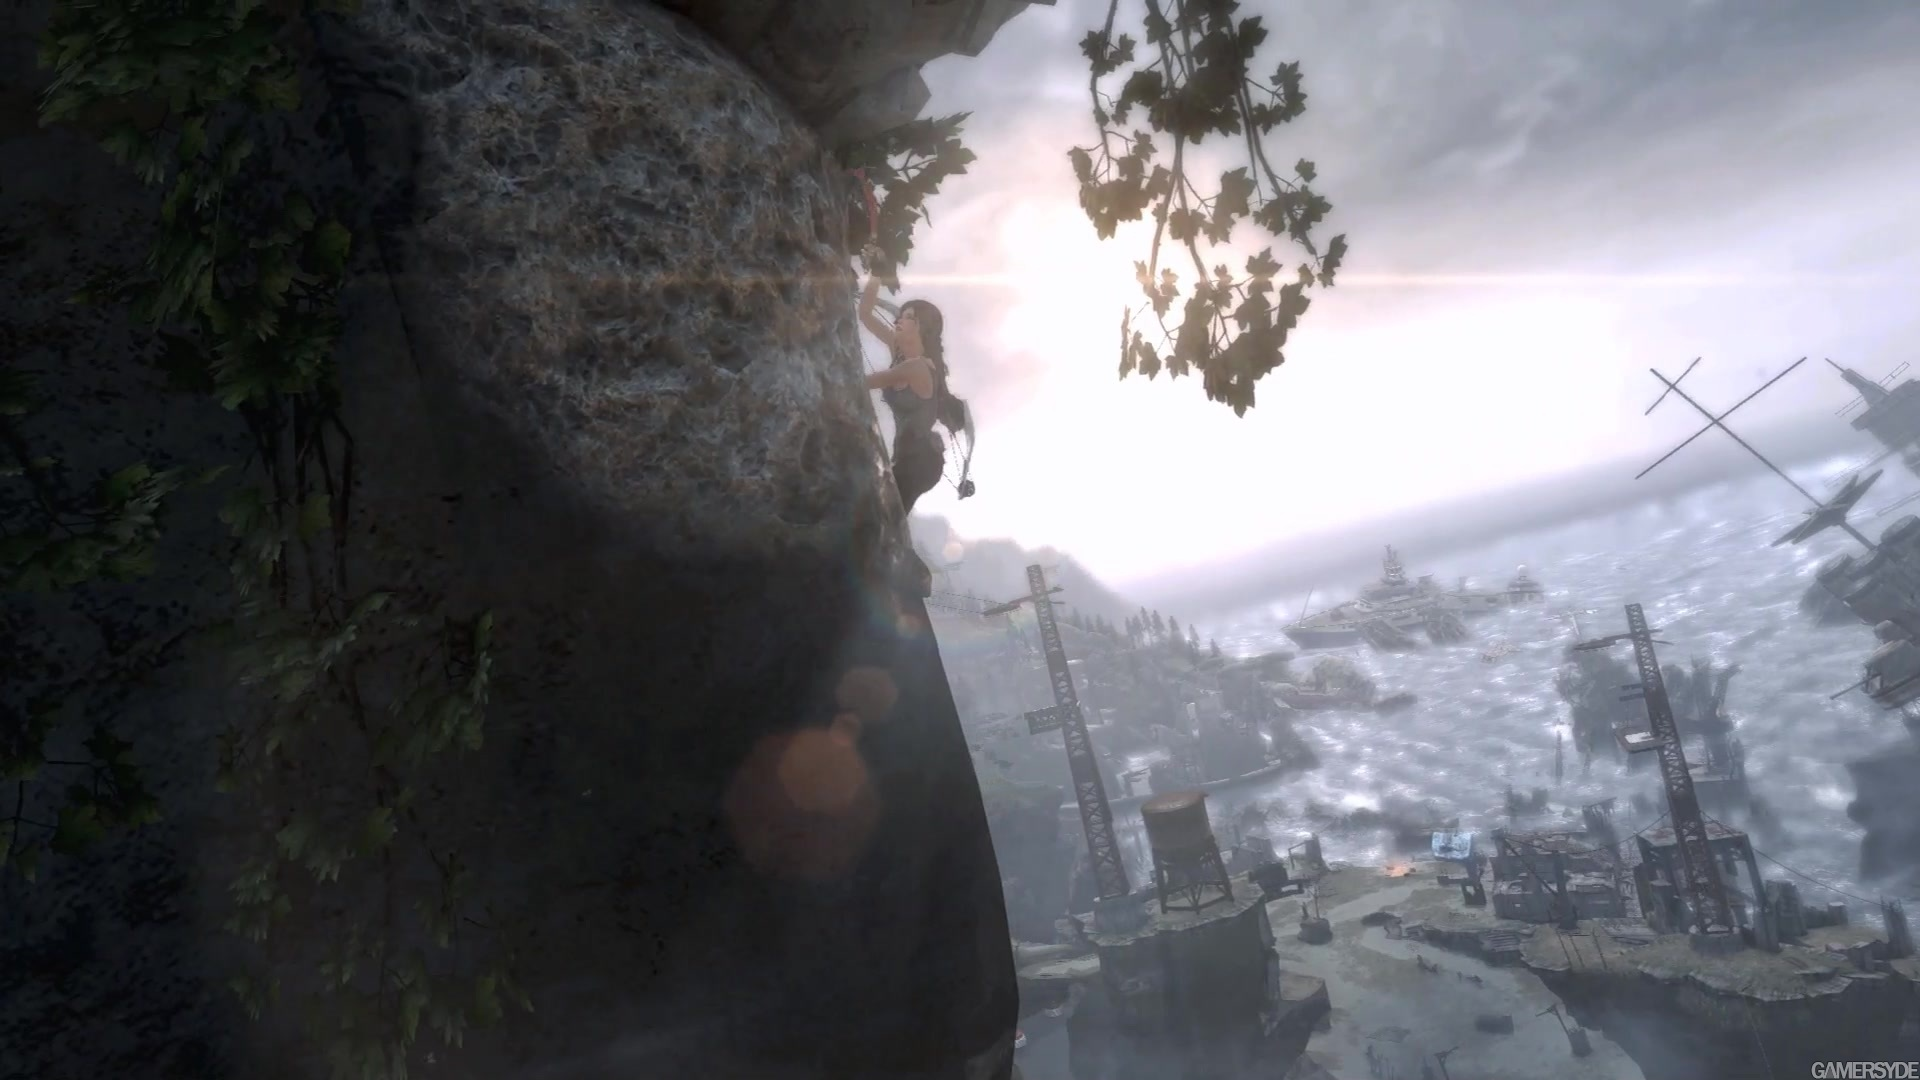 image tomb raider 24052 1912 0024 تصاویر جدیدی از عنوان Tomb Raider: Definitive Edition منتشر شد